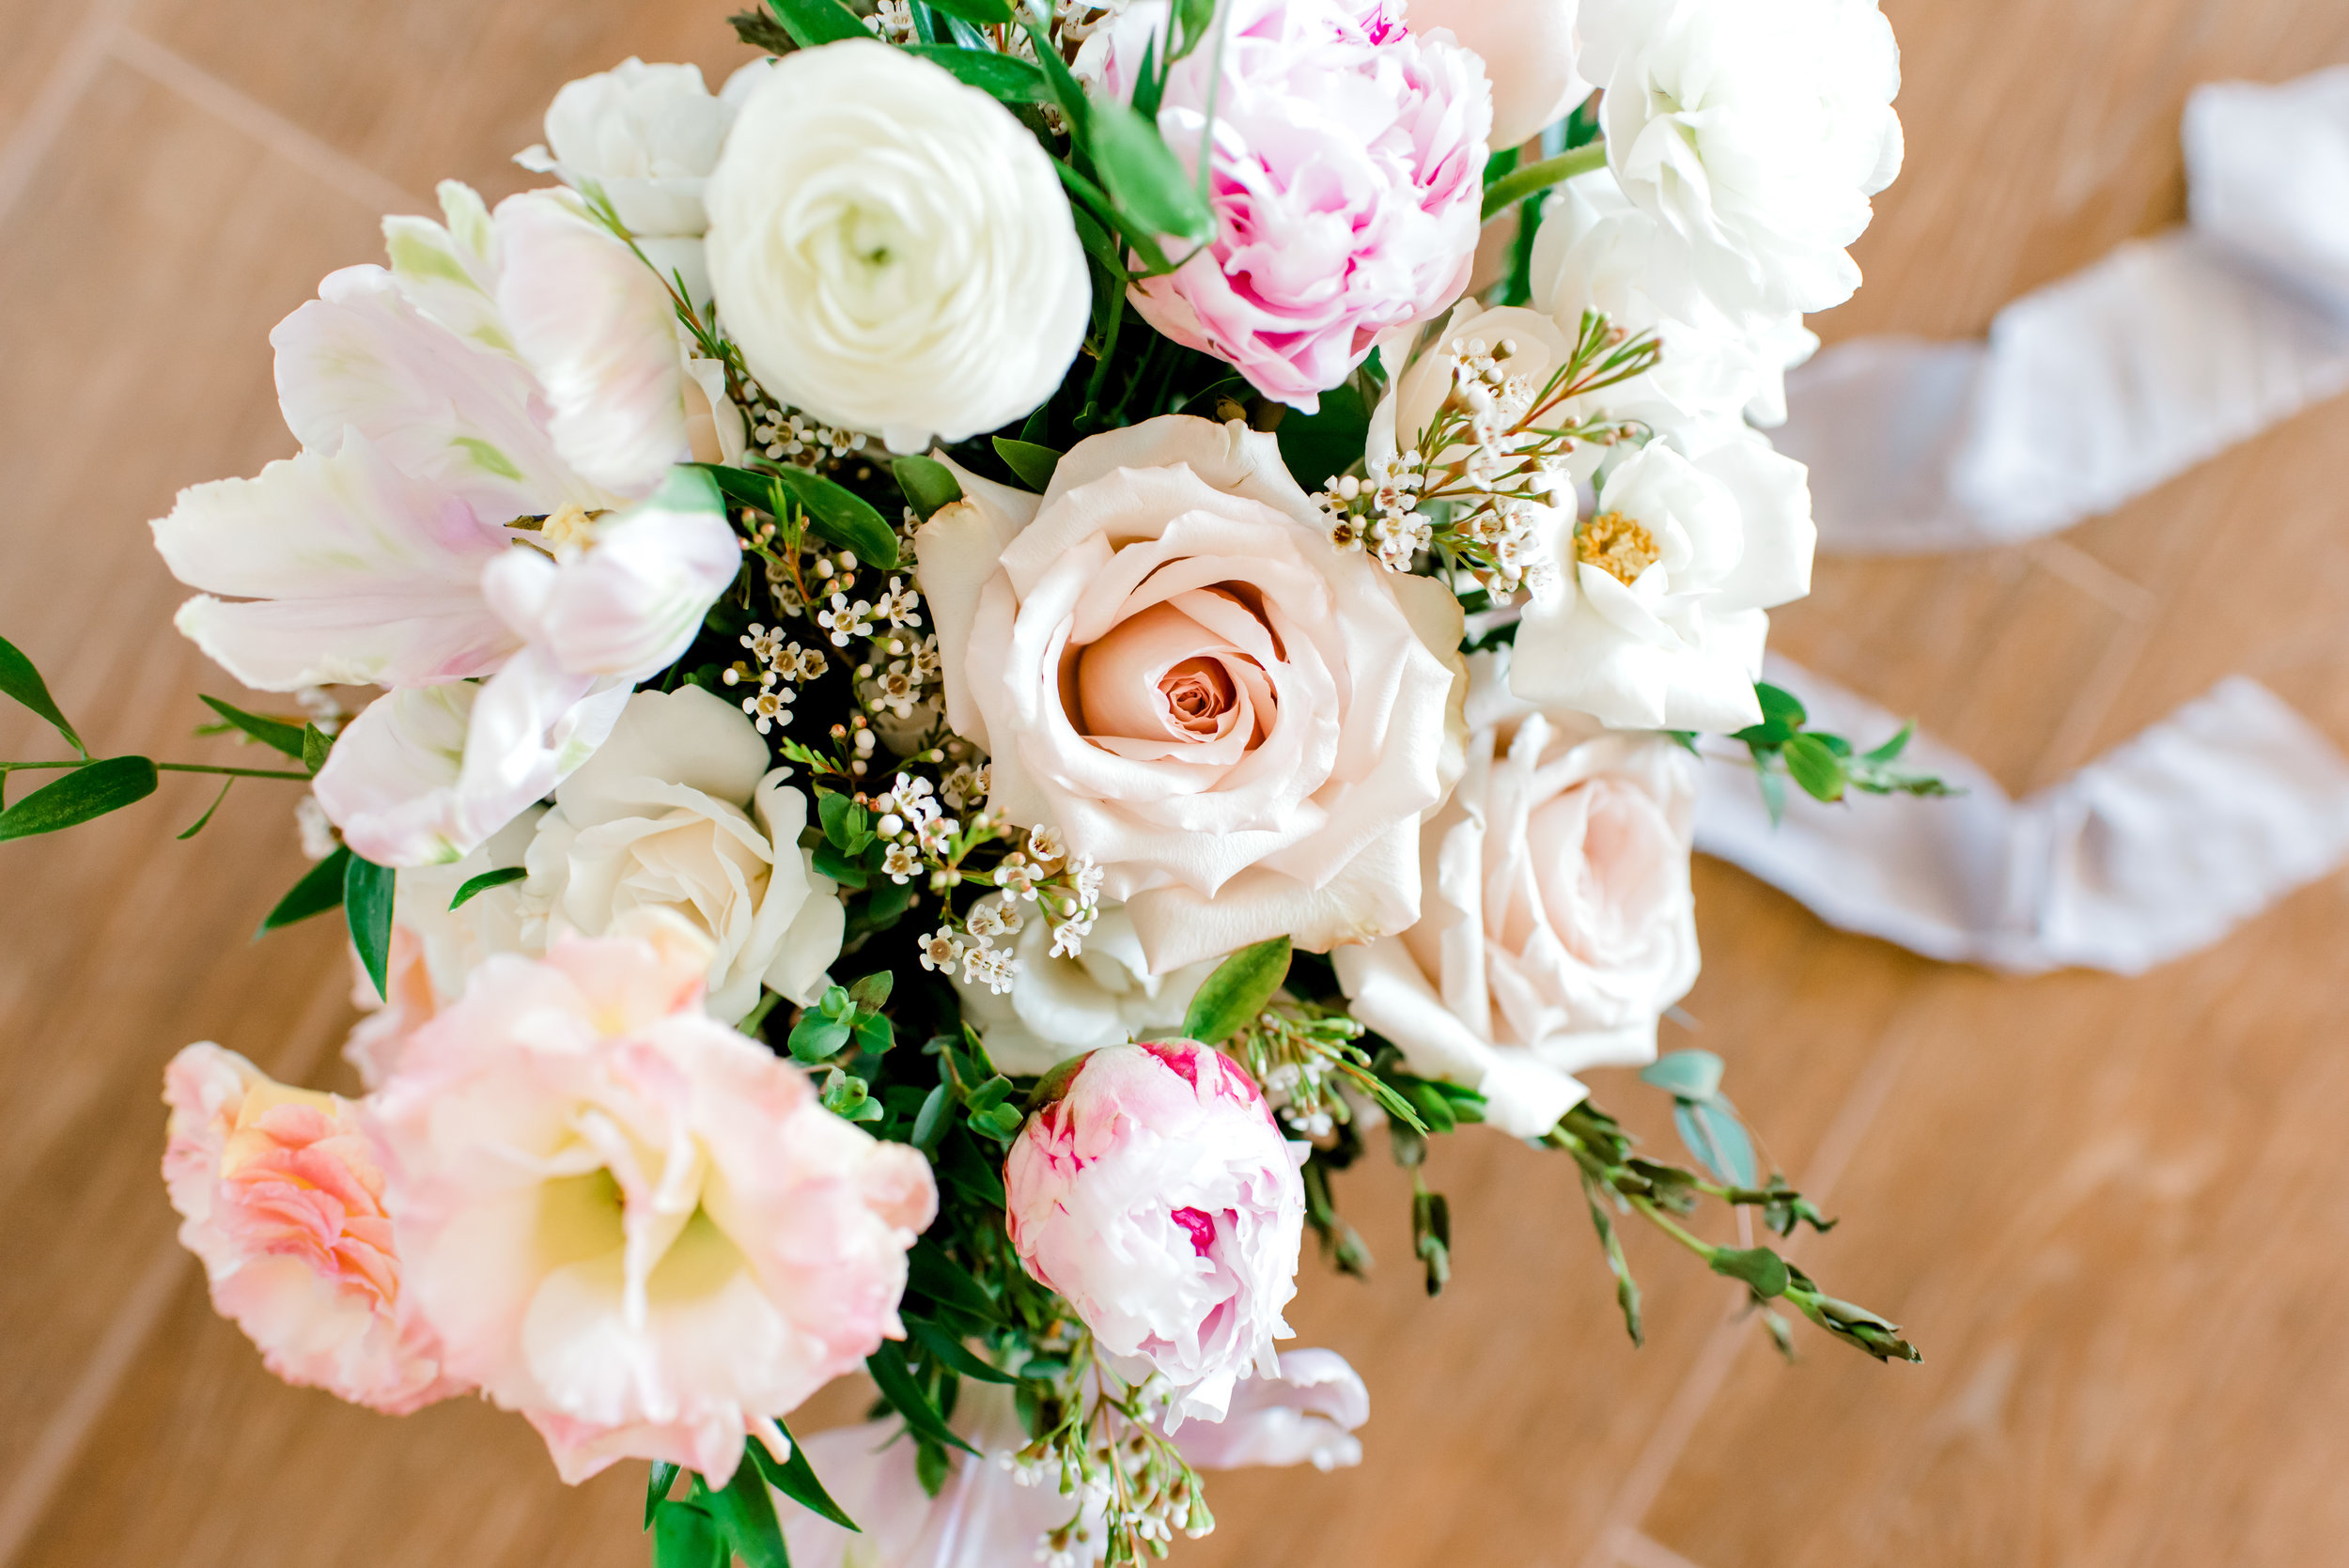 Blush and white backyard wedding - Bridal Bouquet